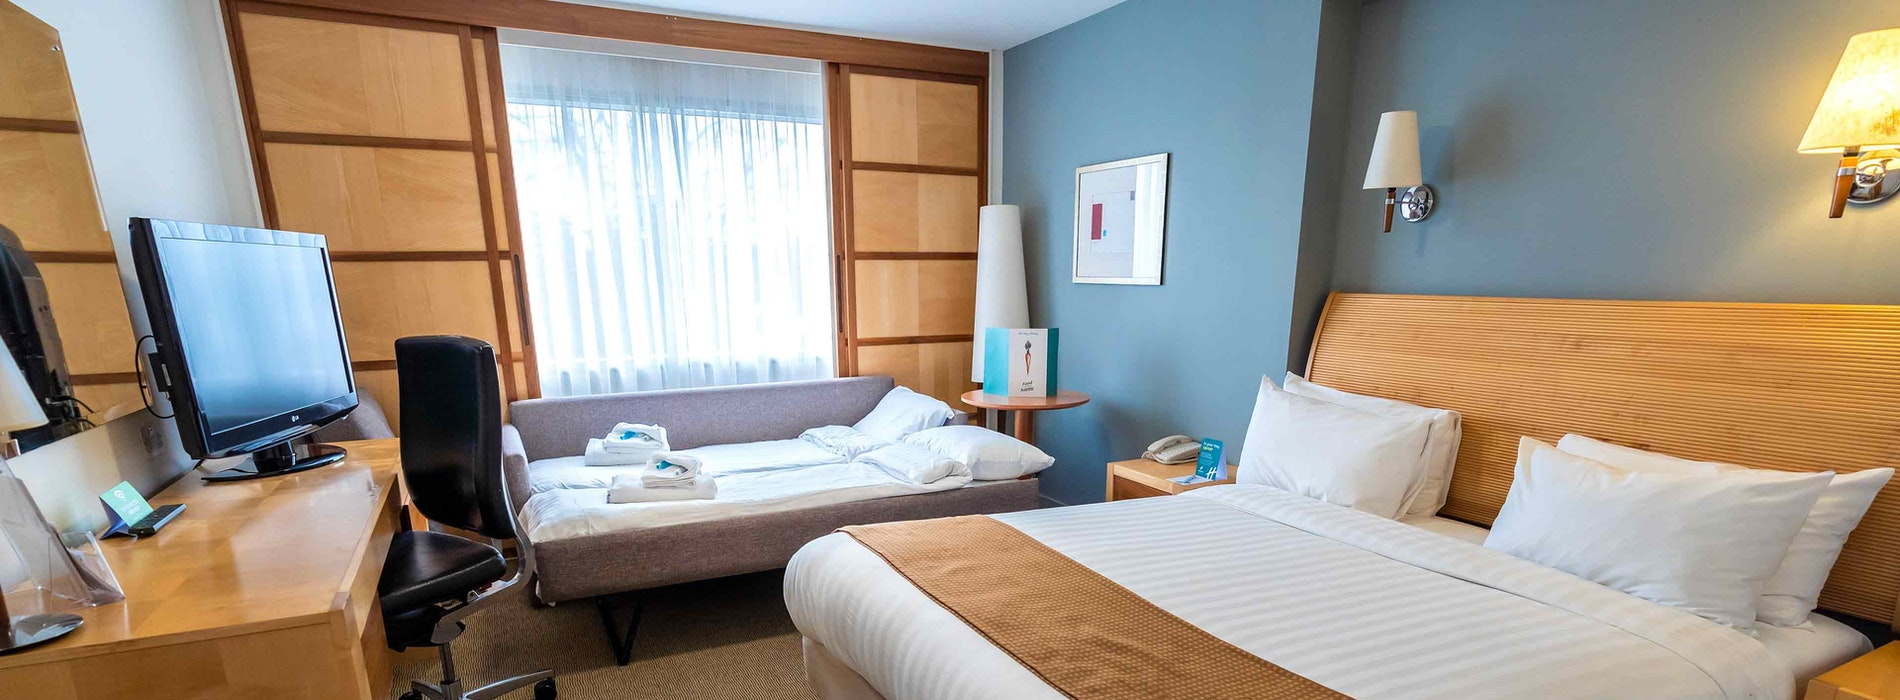 Holiday Inn London Heathrow M4 J4 near LEGOLAND® Windsor Resort